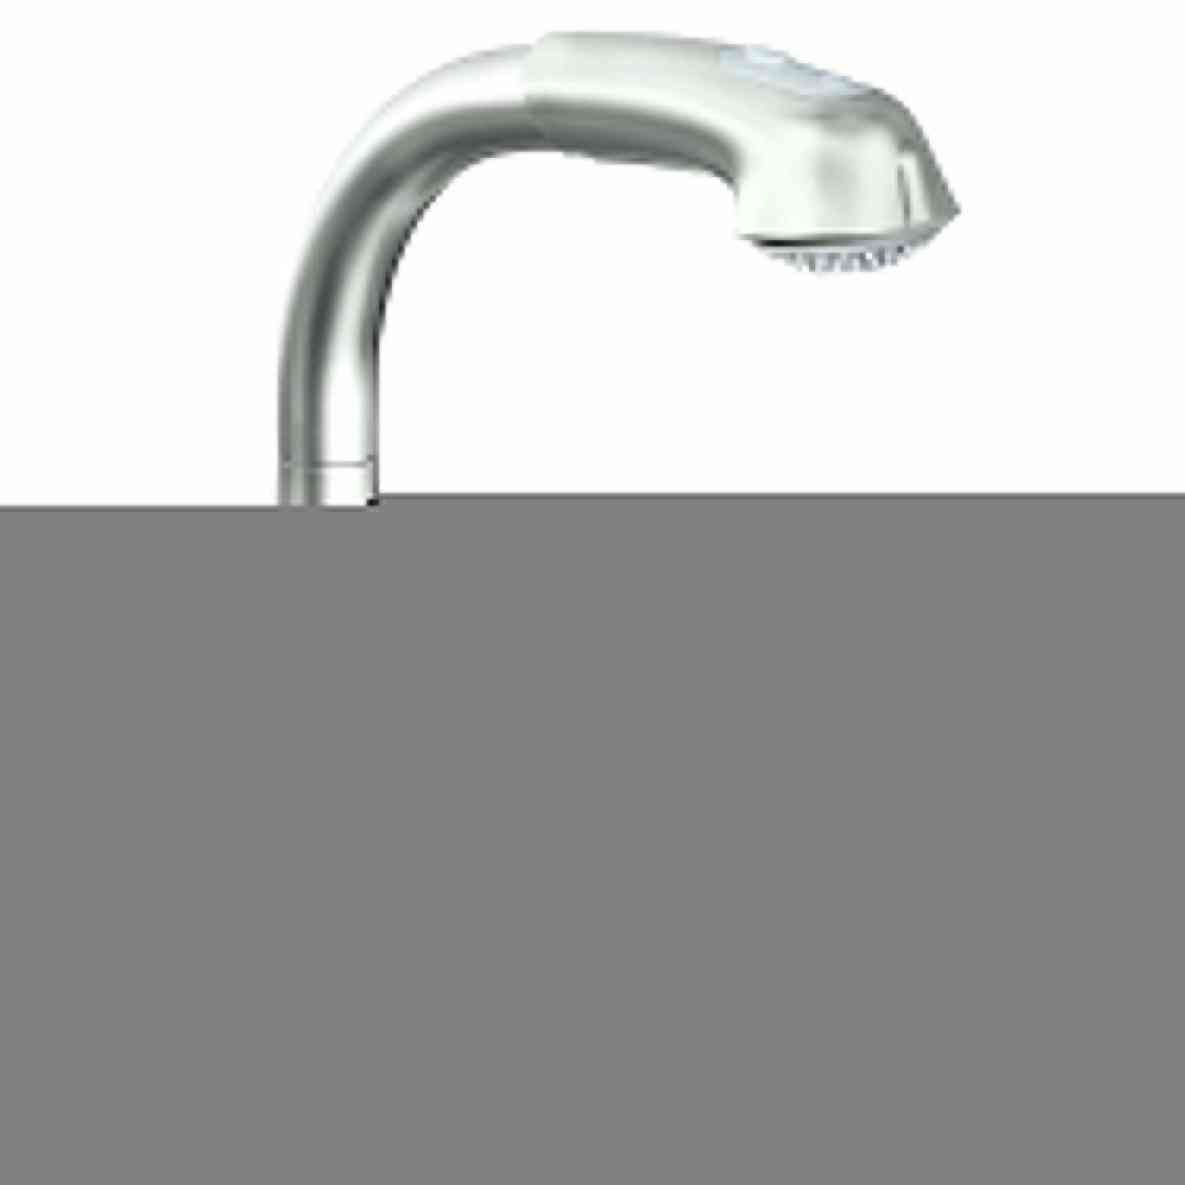 New Post moen bathroom faucets canada | Bathroom_Ideas | Pinterest ...